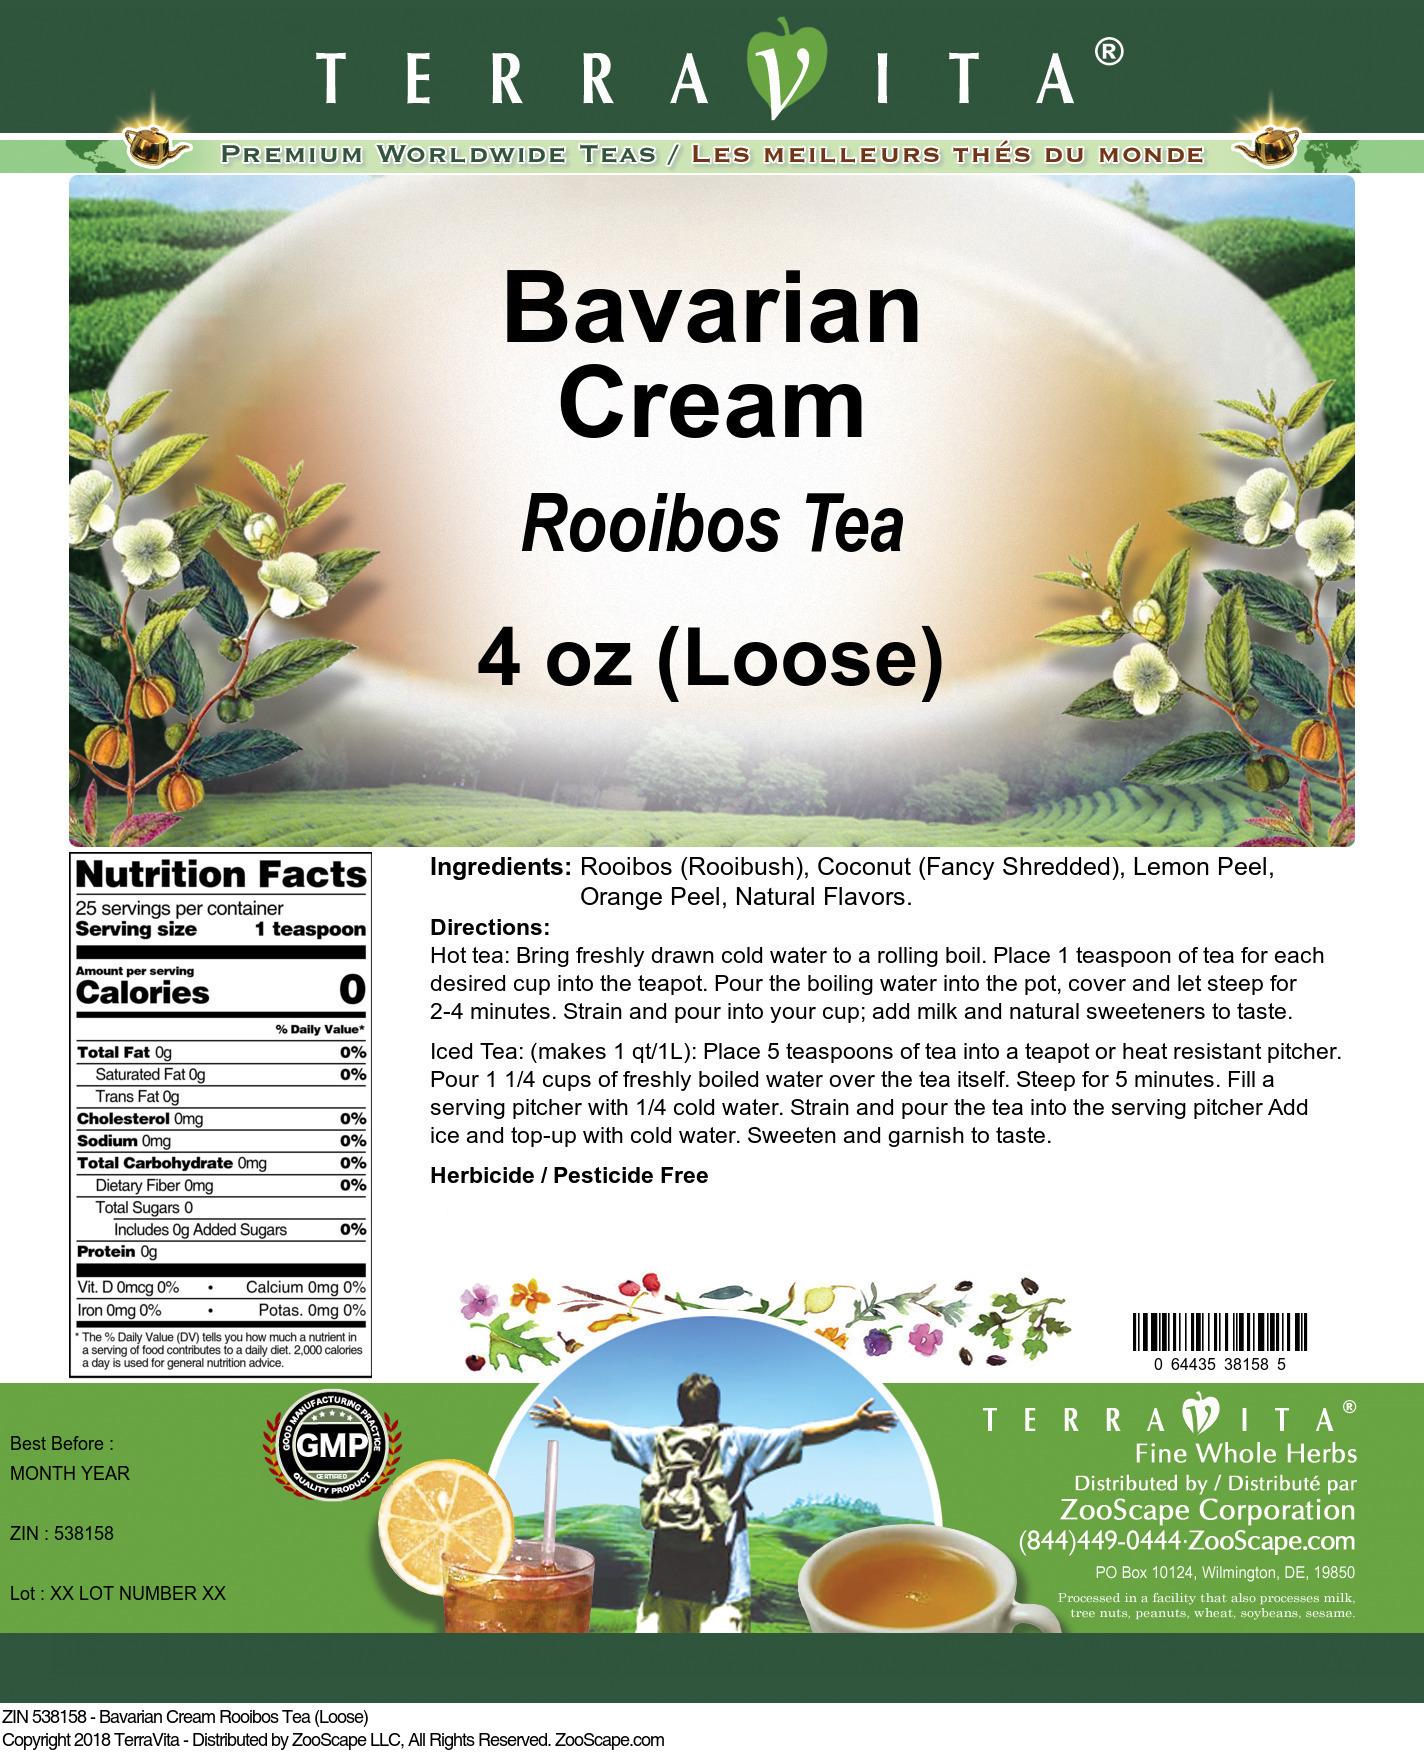 Bavarian Cream Rooibos Tea (Loose)